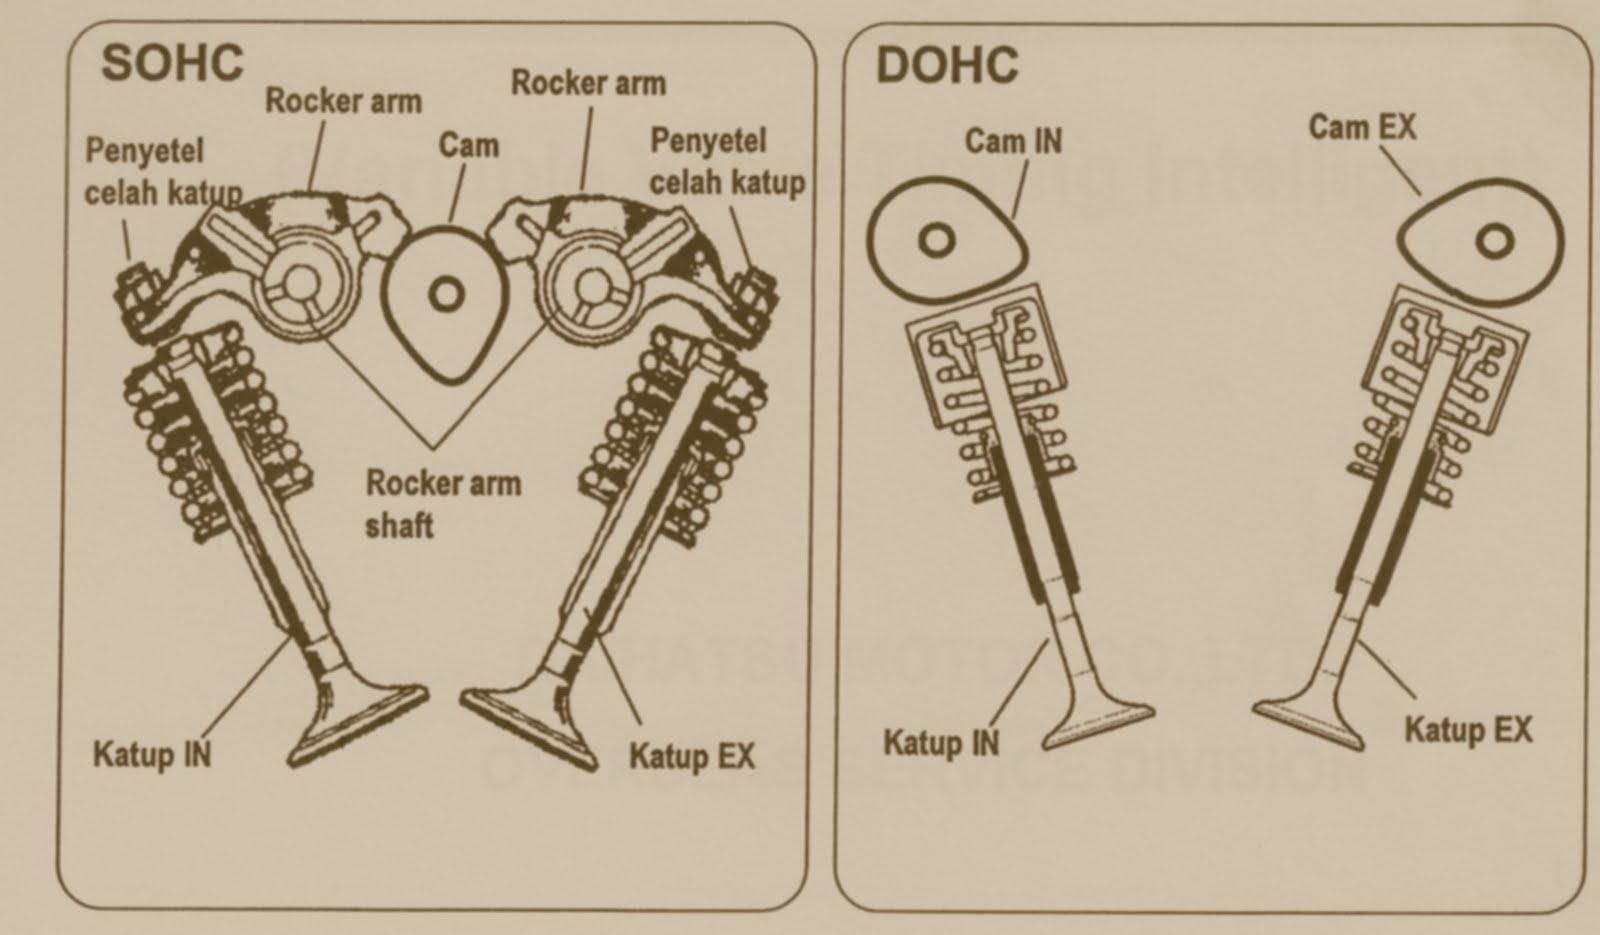 Схемы SOHC и DOHC